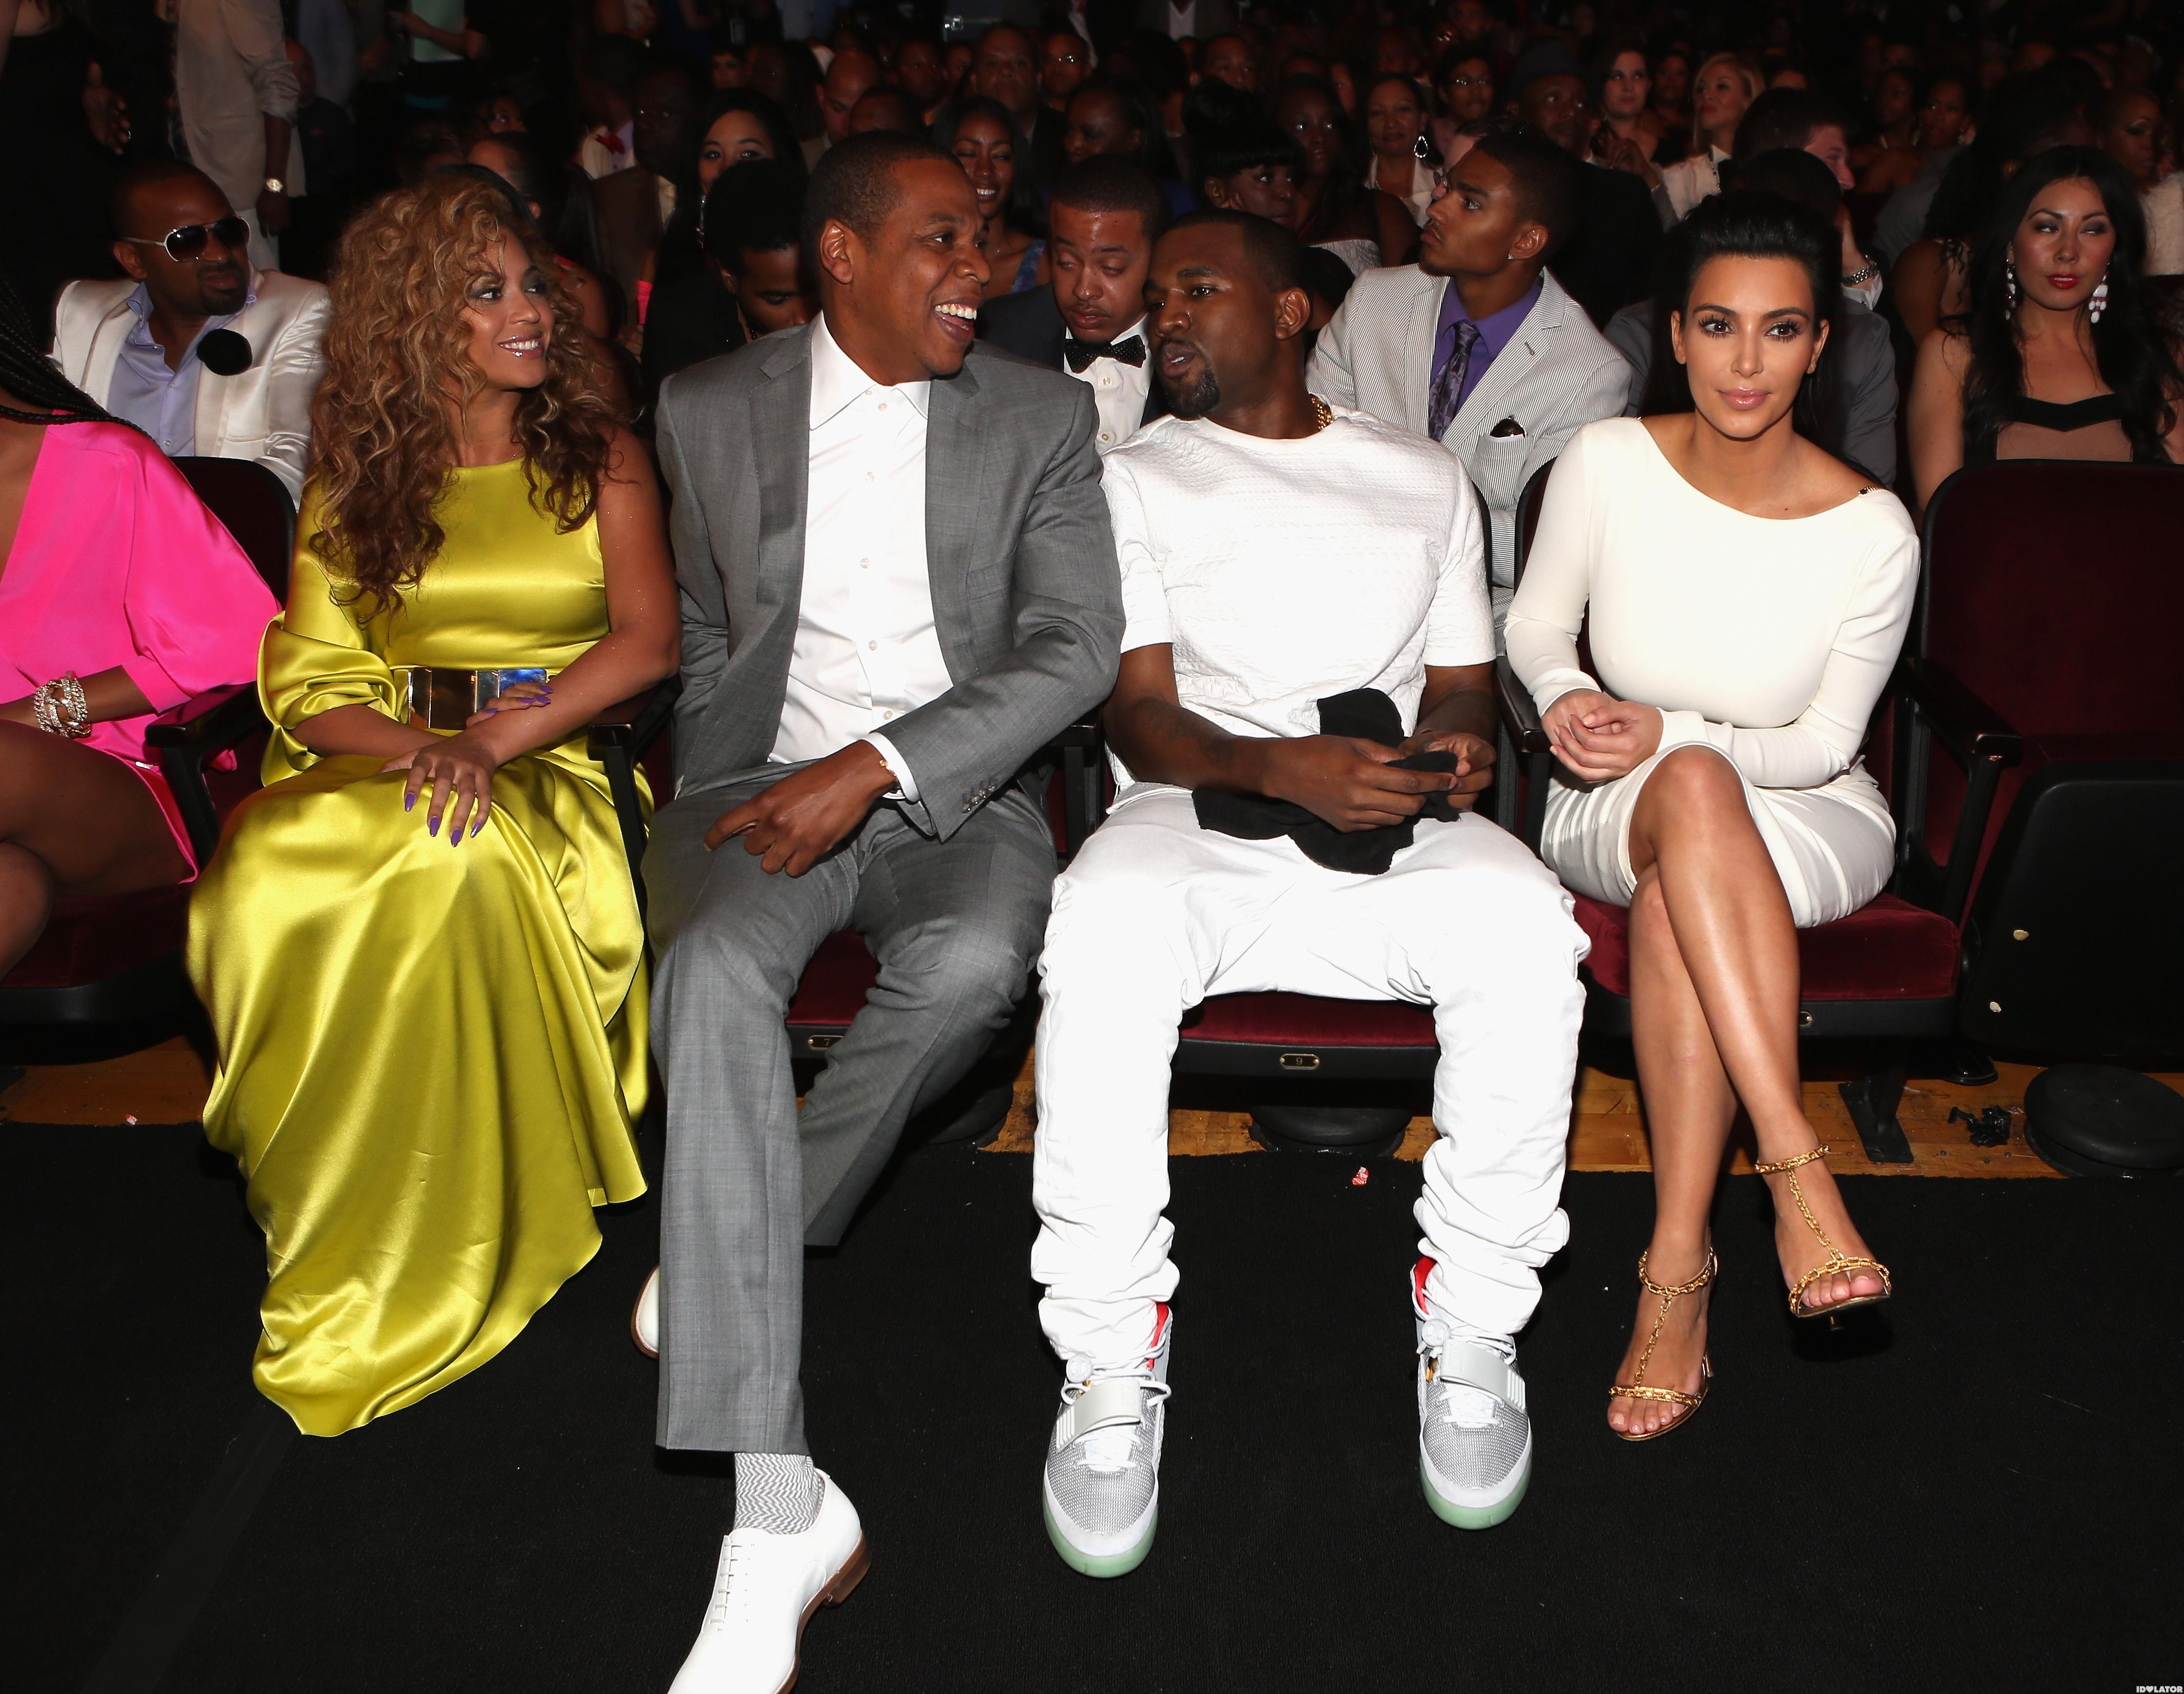 Beyonce, Jay-Z, Kim Kardashian & Kanye West Watch The BET Awards Together